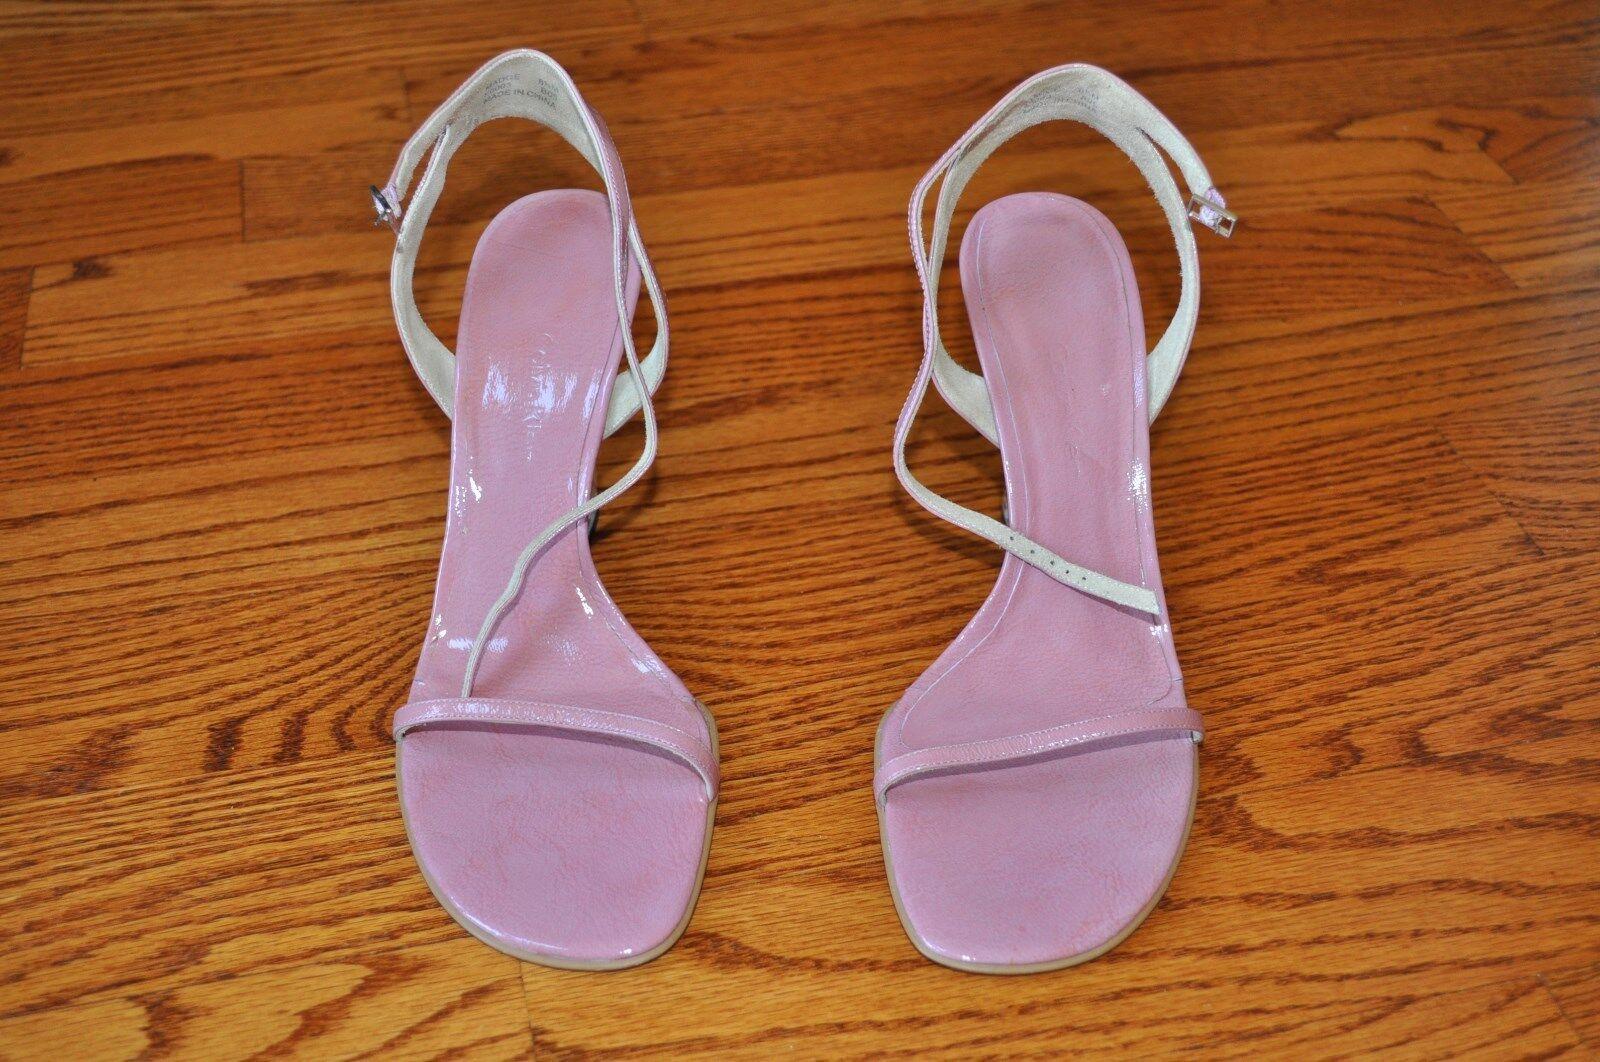 Damenschuhe CALVIN KLEIN Pink Leder Wedge Heel Sandales Größe 8.5 M NICE